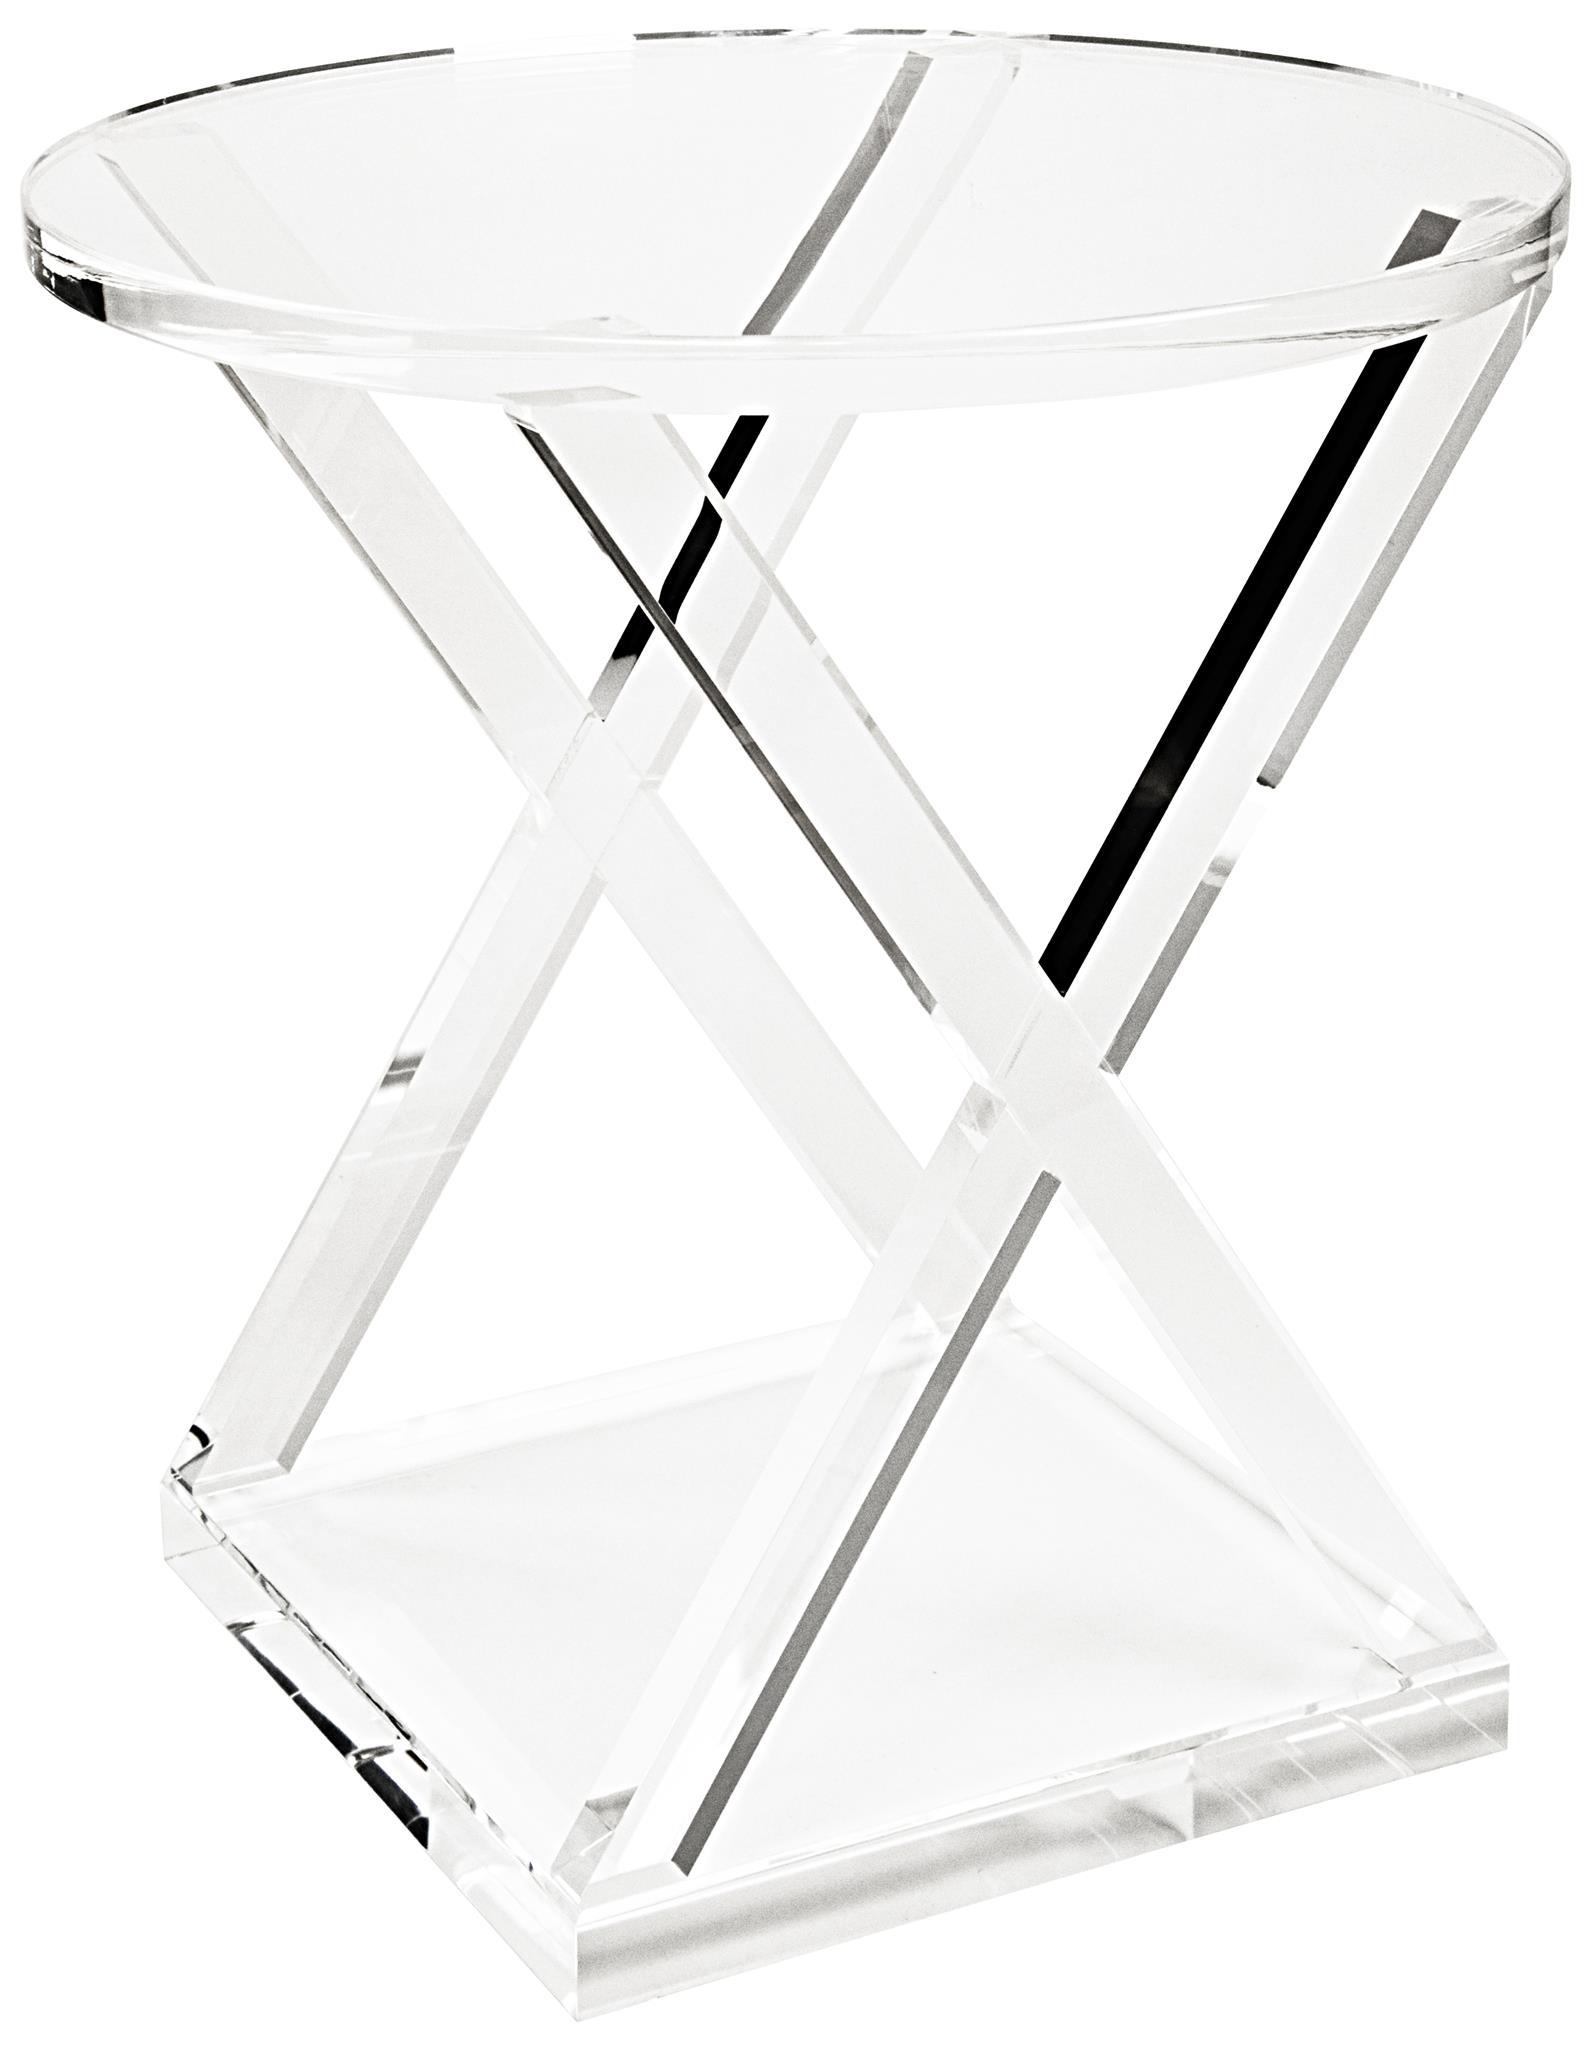 Aussie Acrylic X Side Table